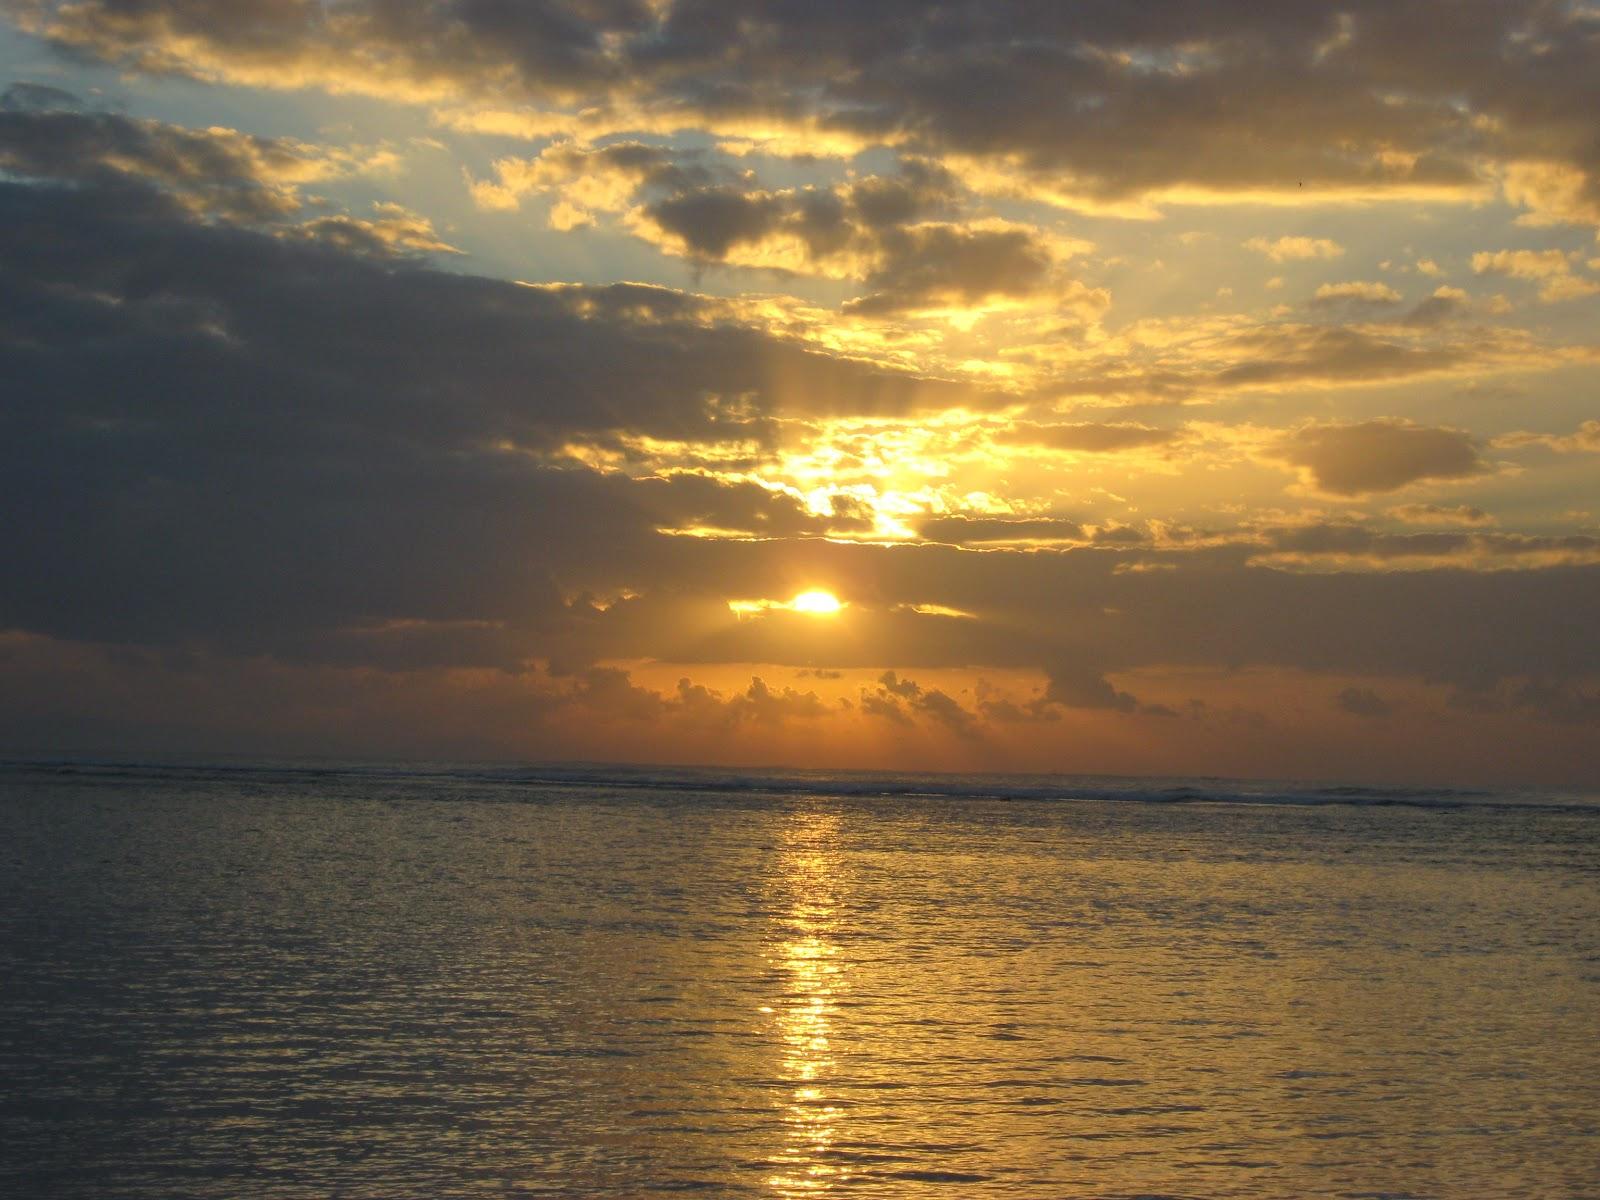 Bali Attractions Sindu Beach Morning View